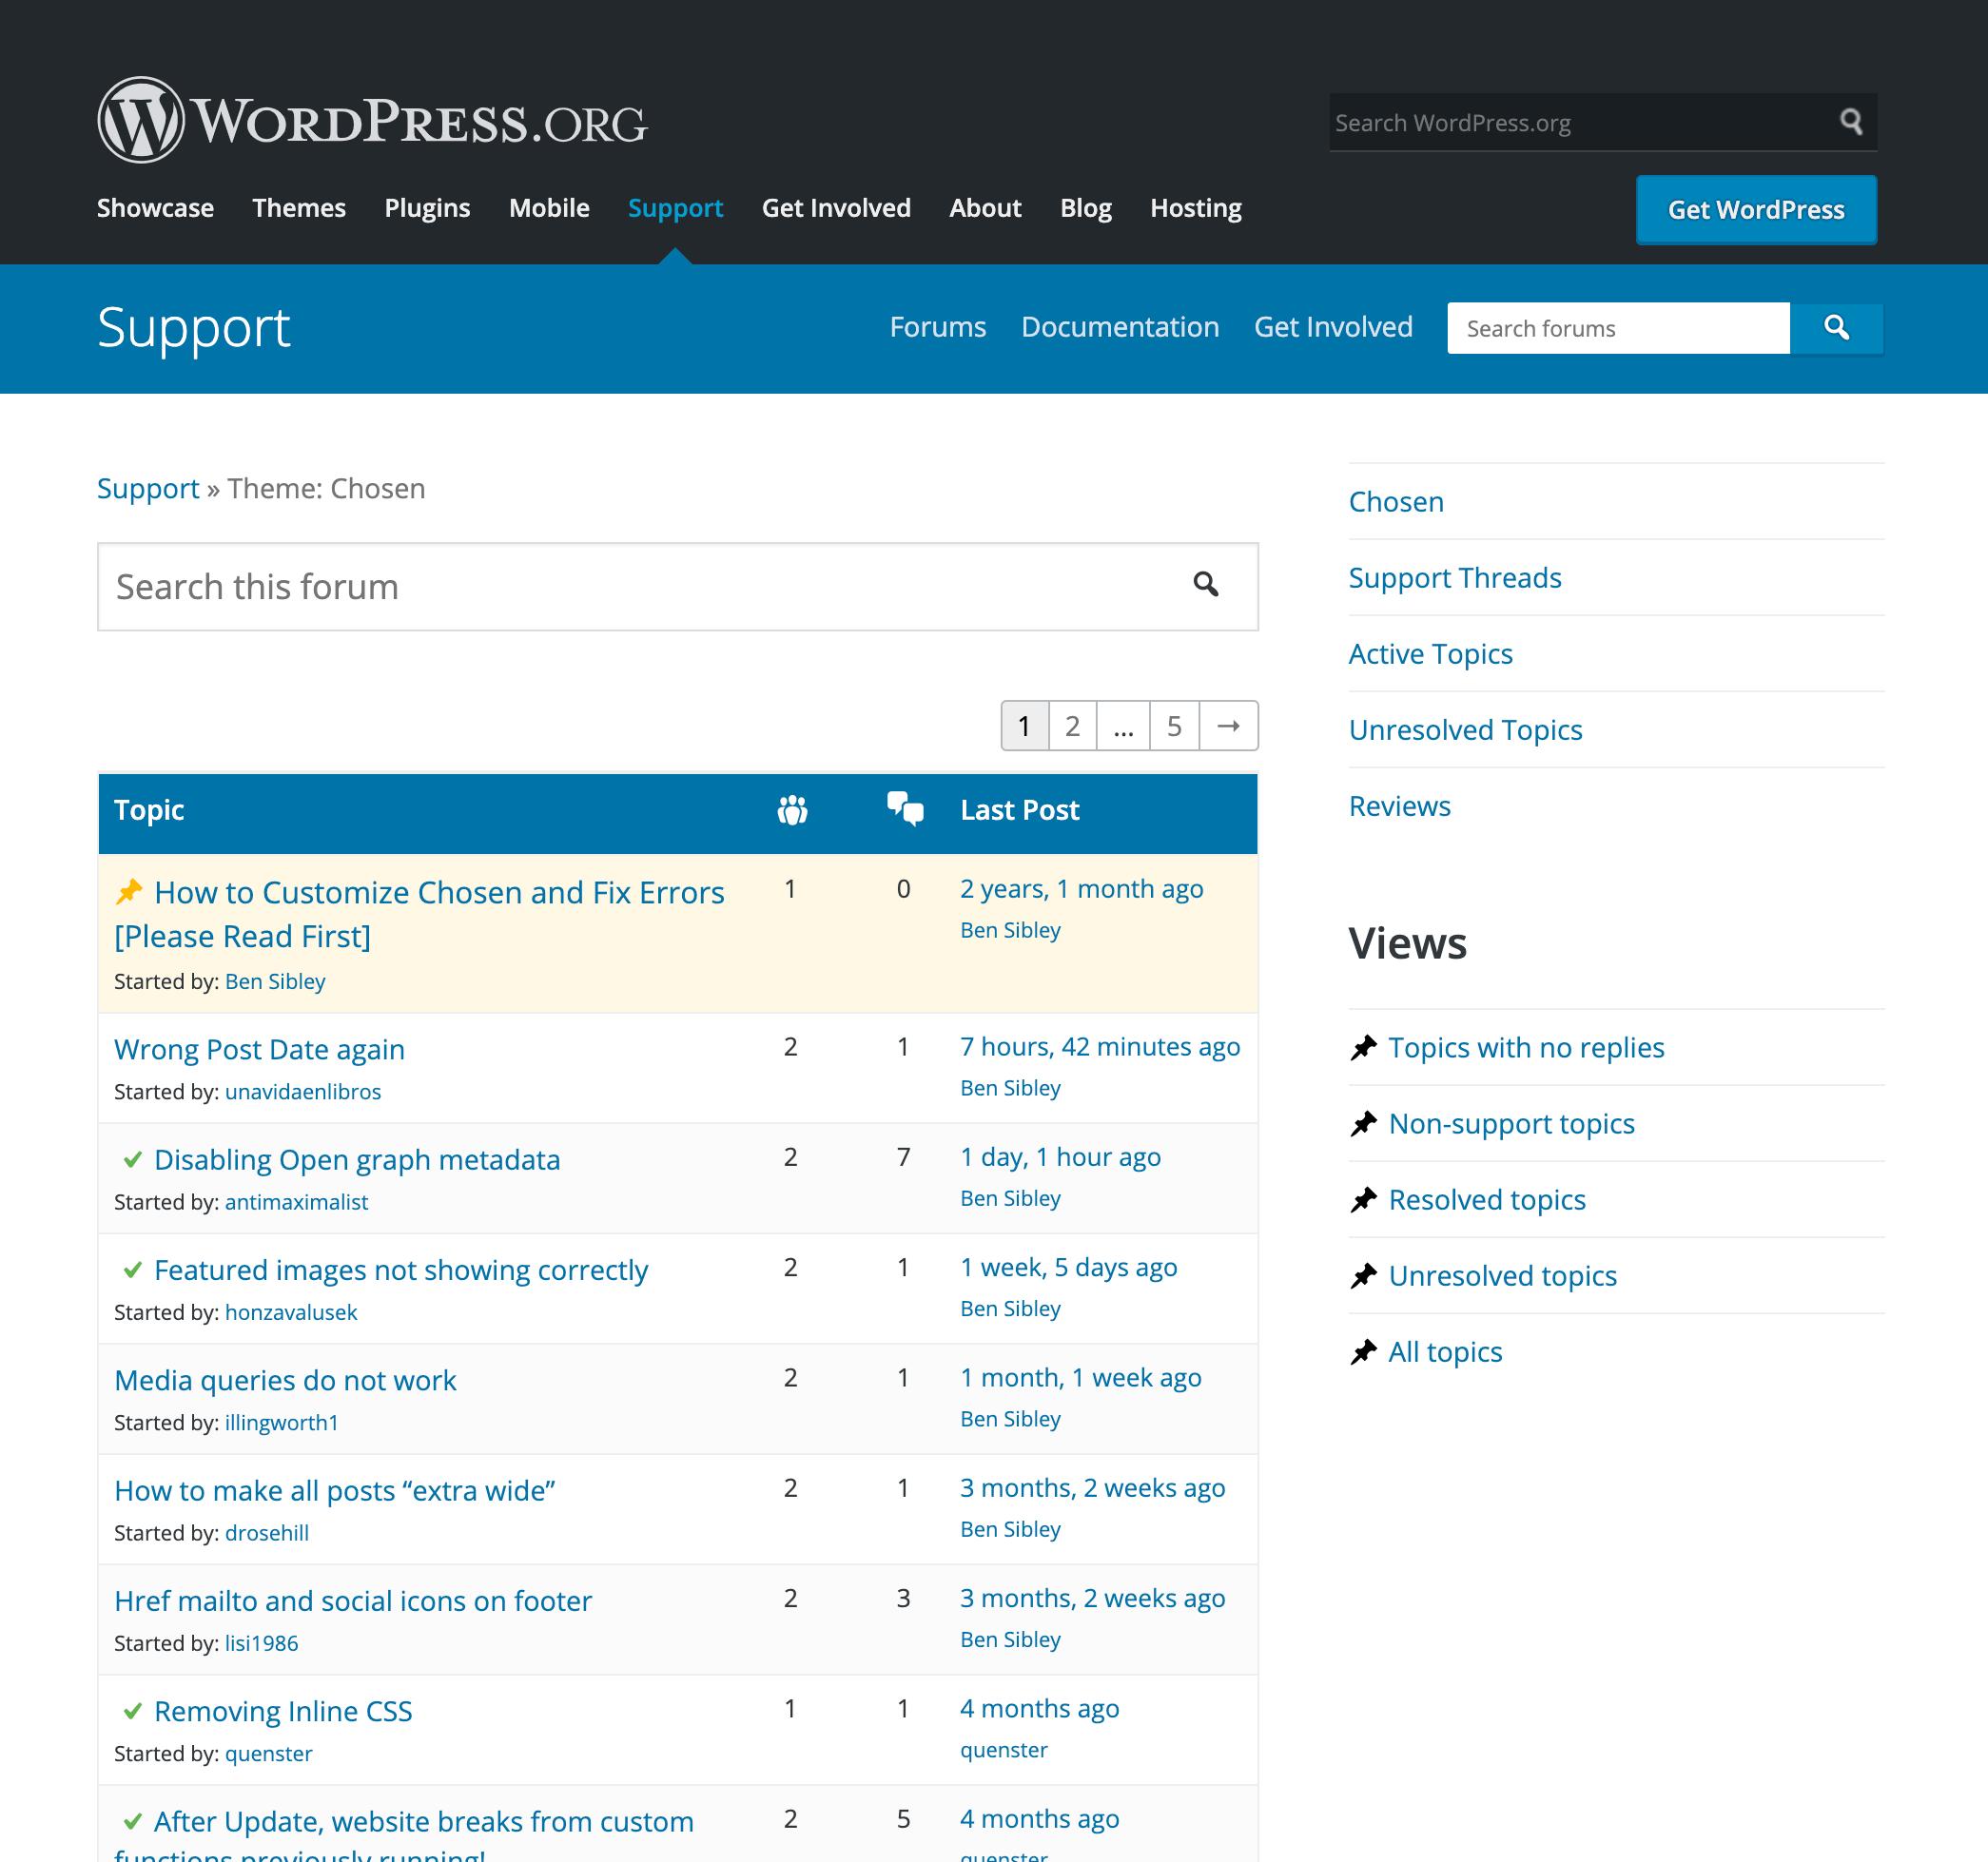 Foros de soporte de WordPress